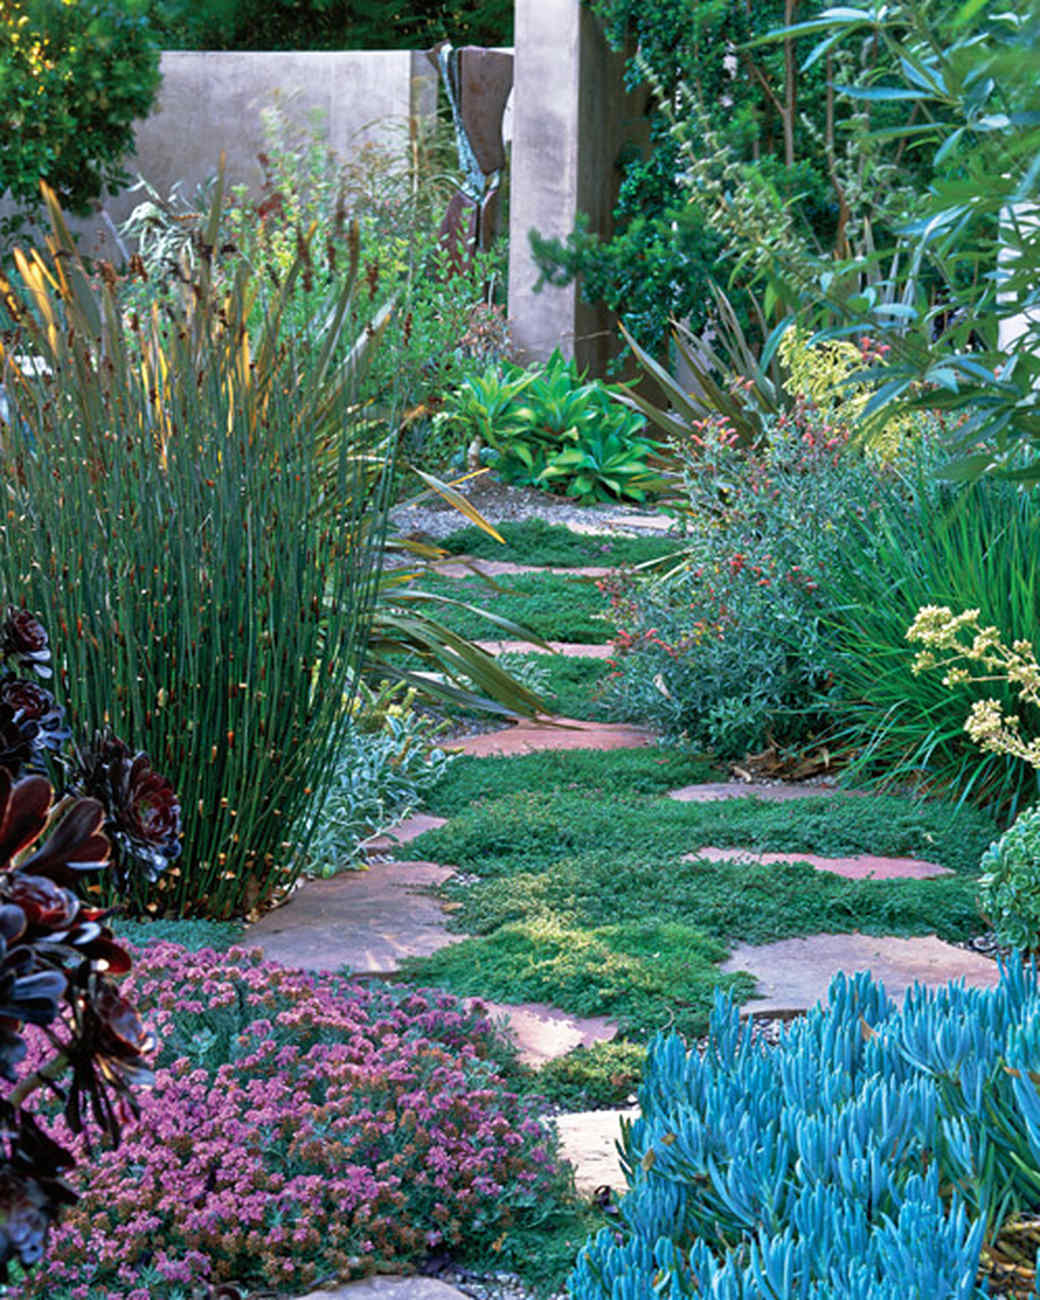 mla10490_0809_vought_garden7.jpg